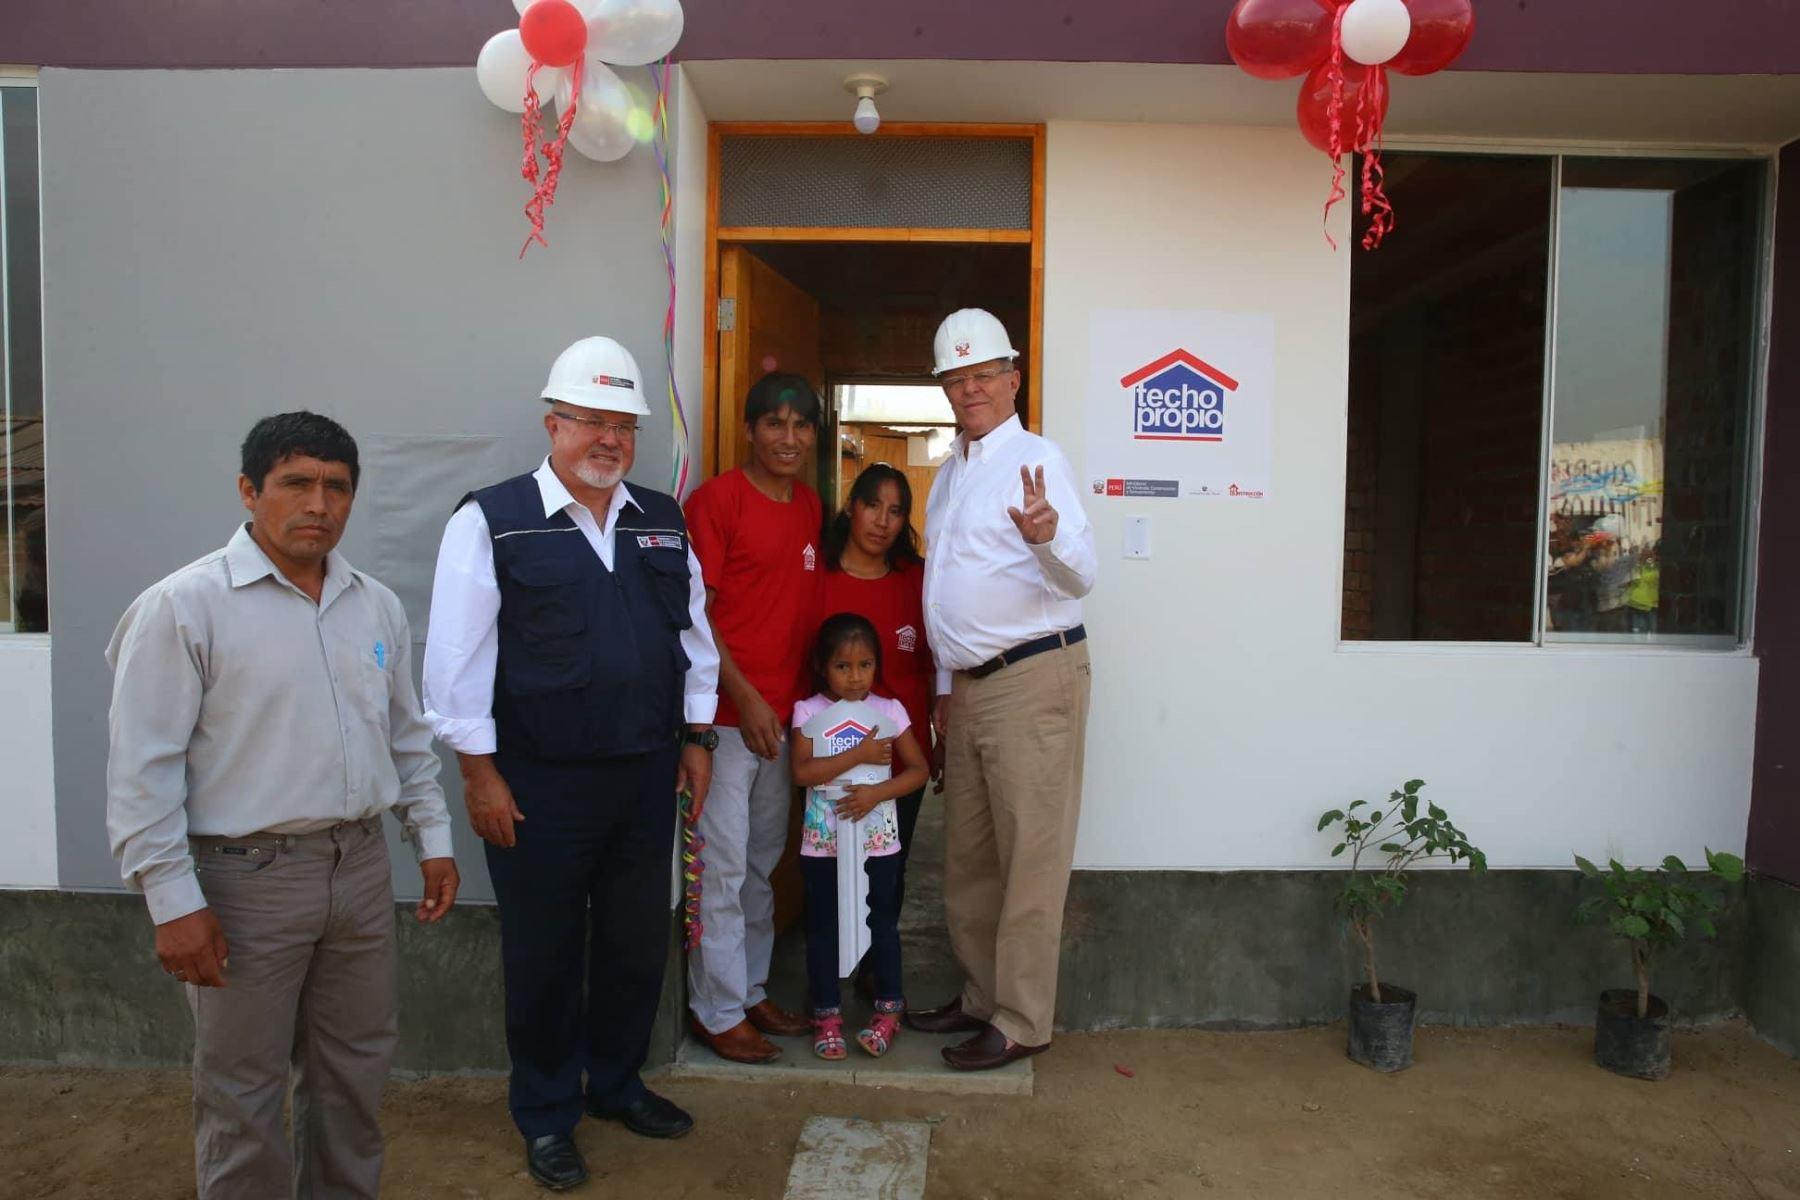 01/03/2018   Presidente Kuczynski entrega la vivienda número 2,000 a escala nacional en Cajamarquilla (Lurigancho). Foto: ANDINA/ Prensa Presidencia.